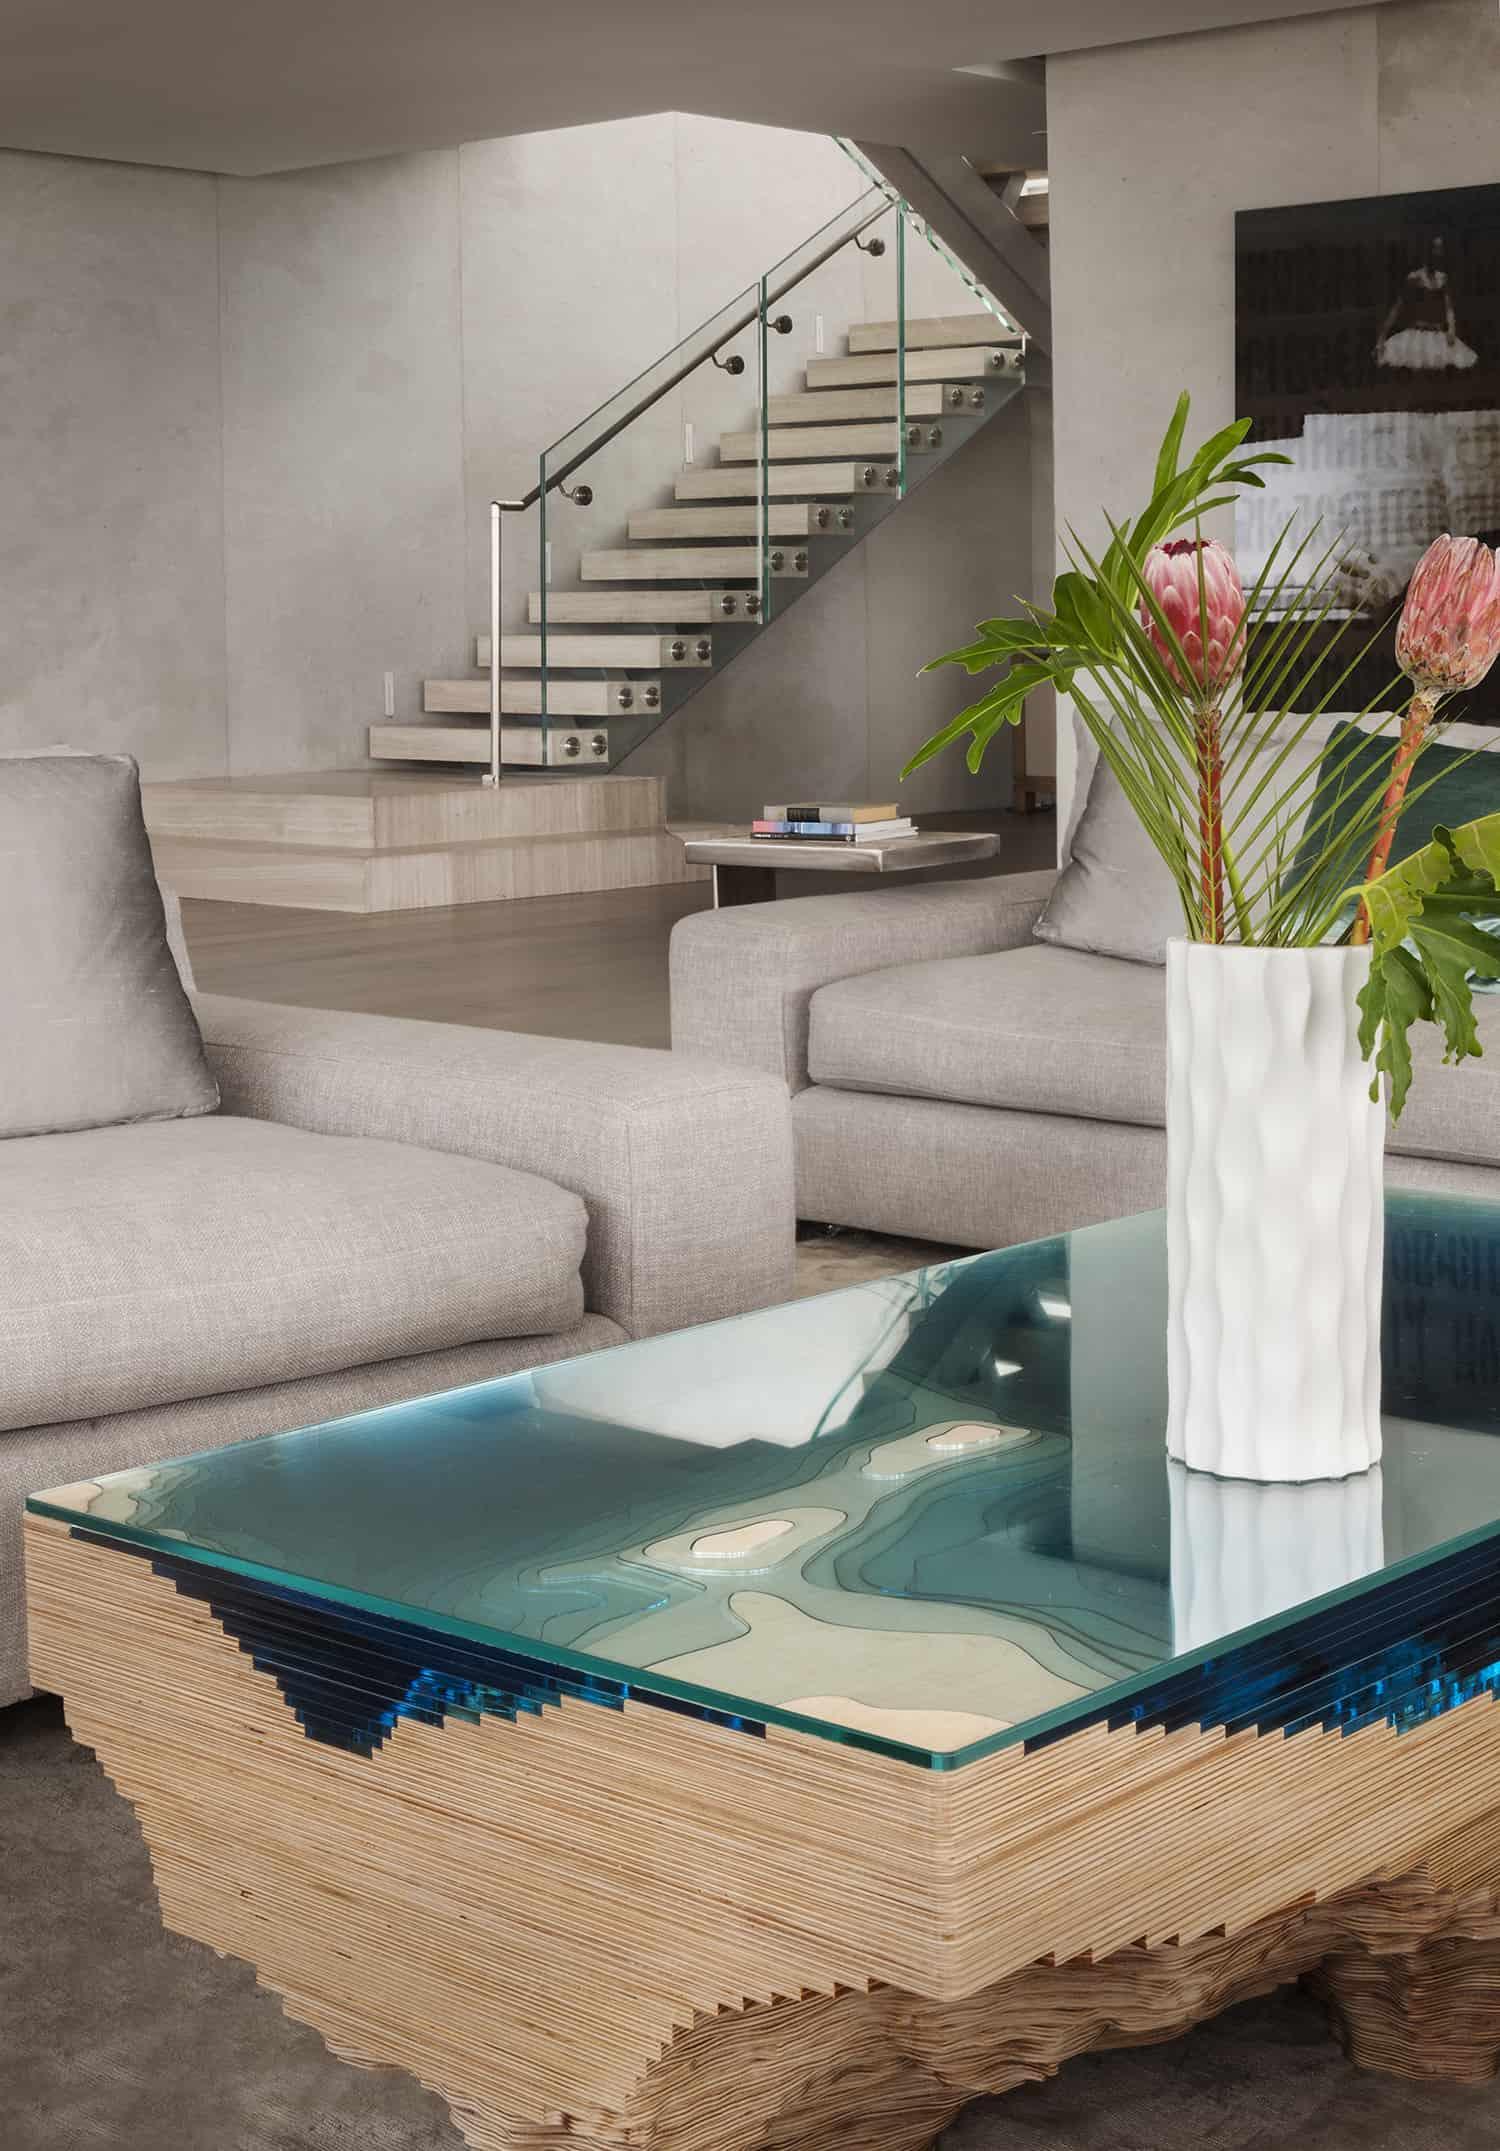 suvremeni penthouse-dnevna soba